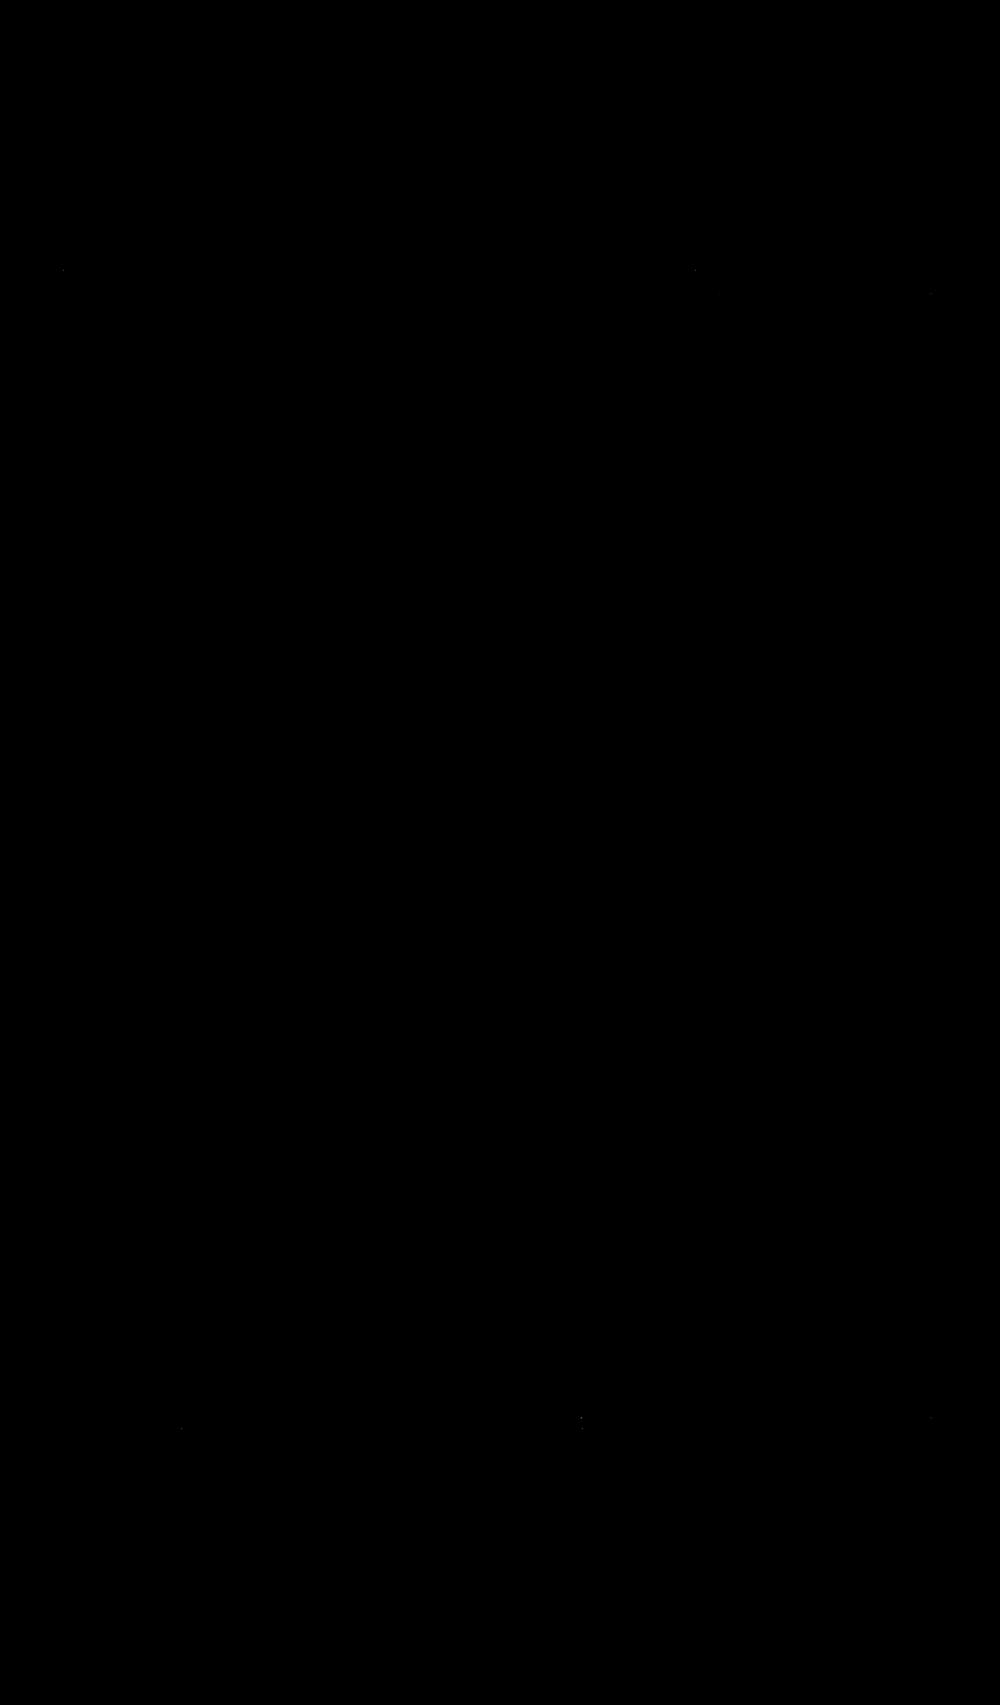 Tech Drawing Reflex Hosetail.png